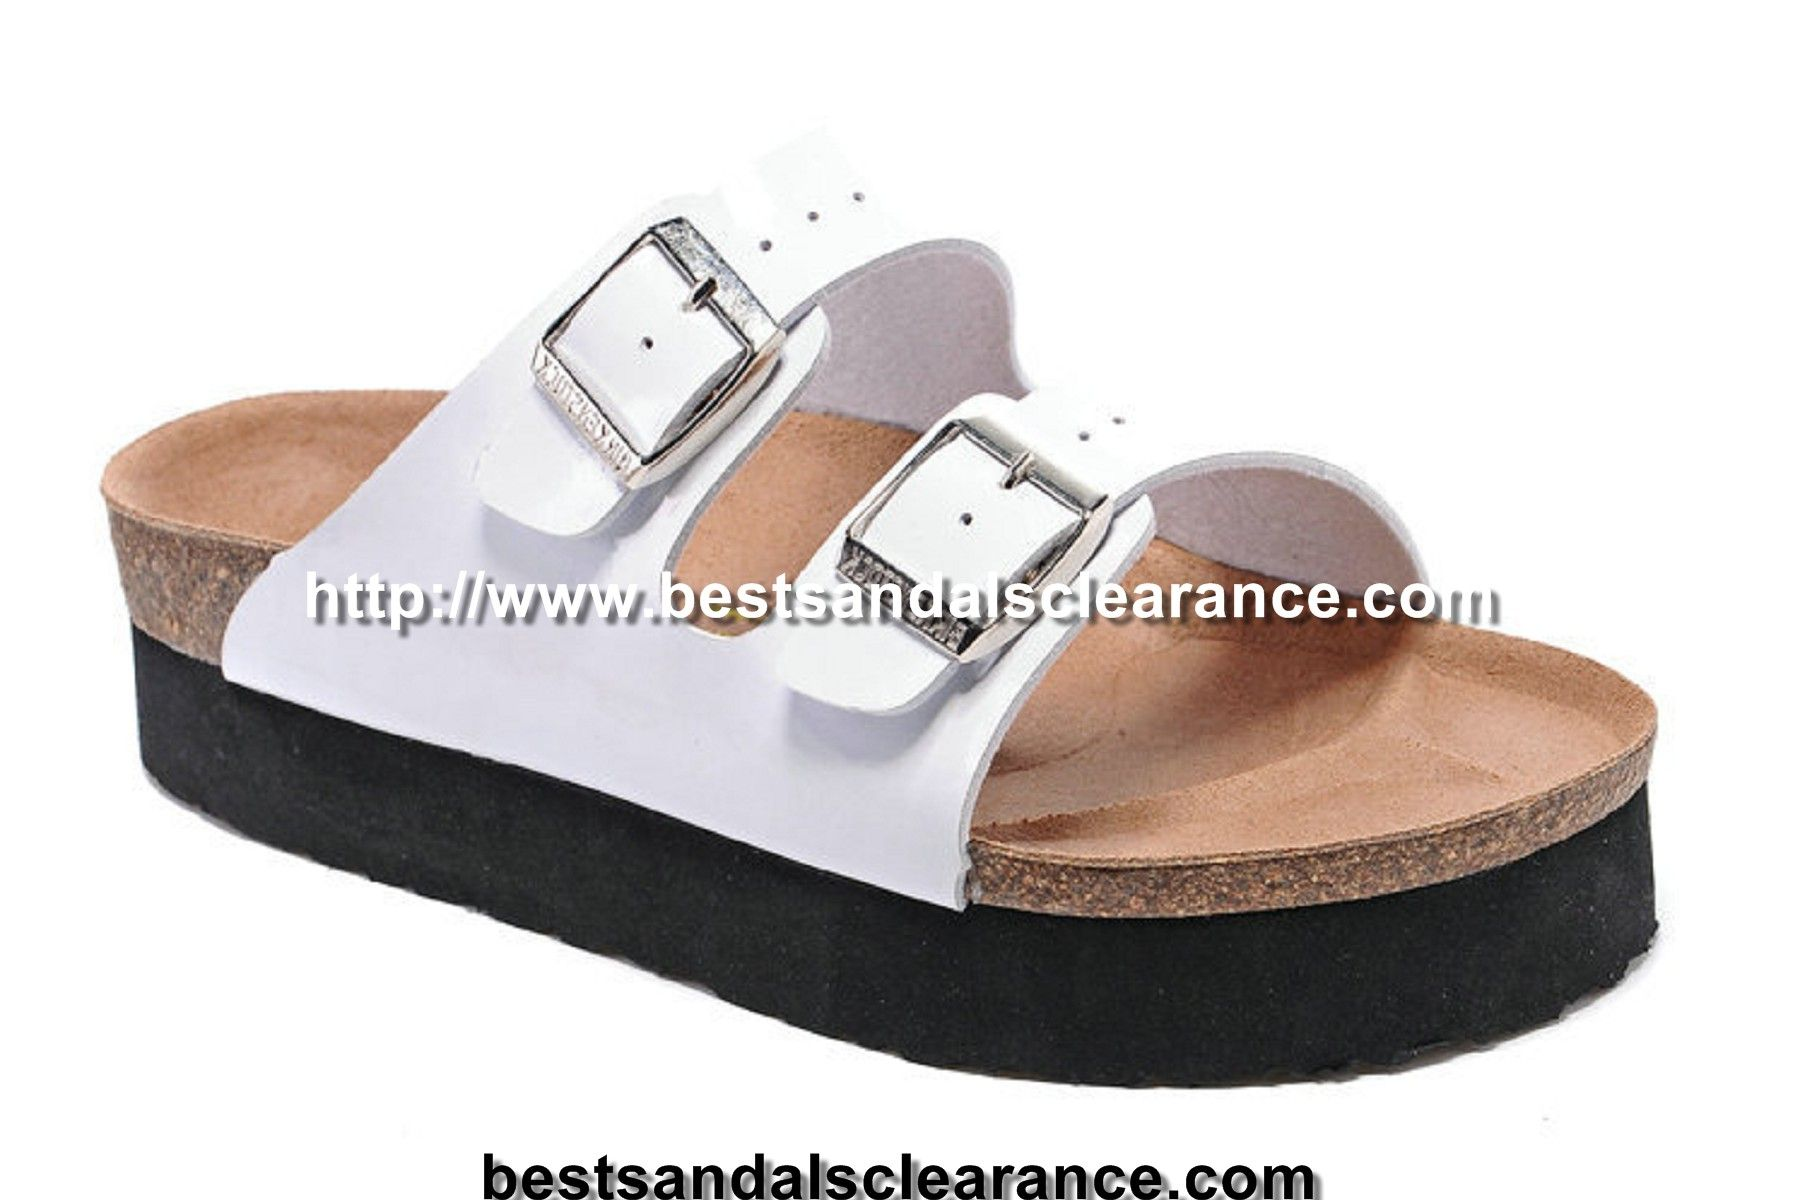 422f364366e45 Birkenstock Arizona High Heeled Mens Sandals White Outlet Store ...